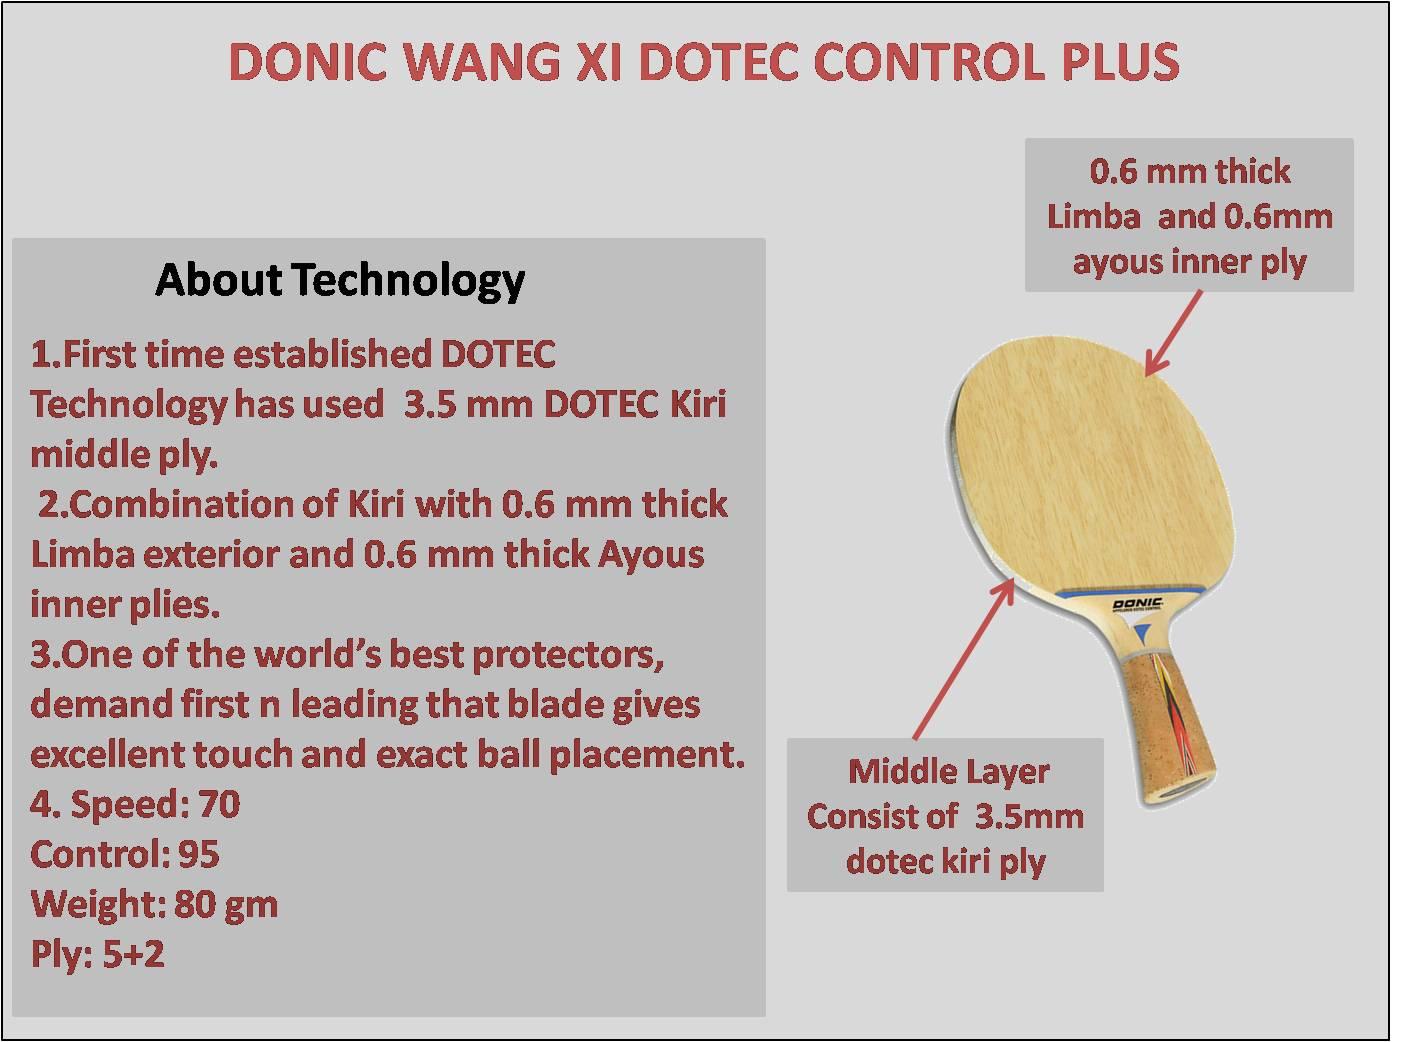 About Donic Wang Xi Dotec Control Plus Table Tennis Rackets